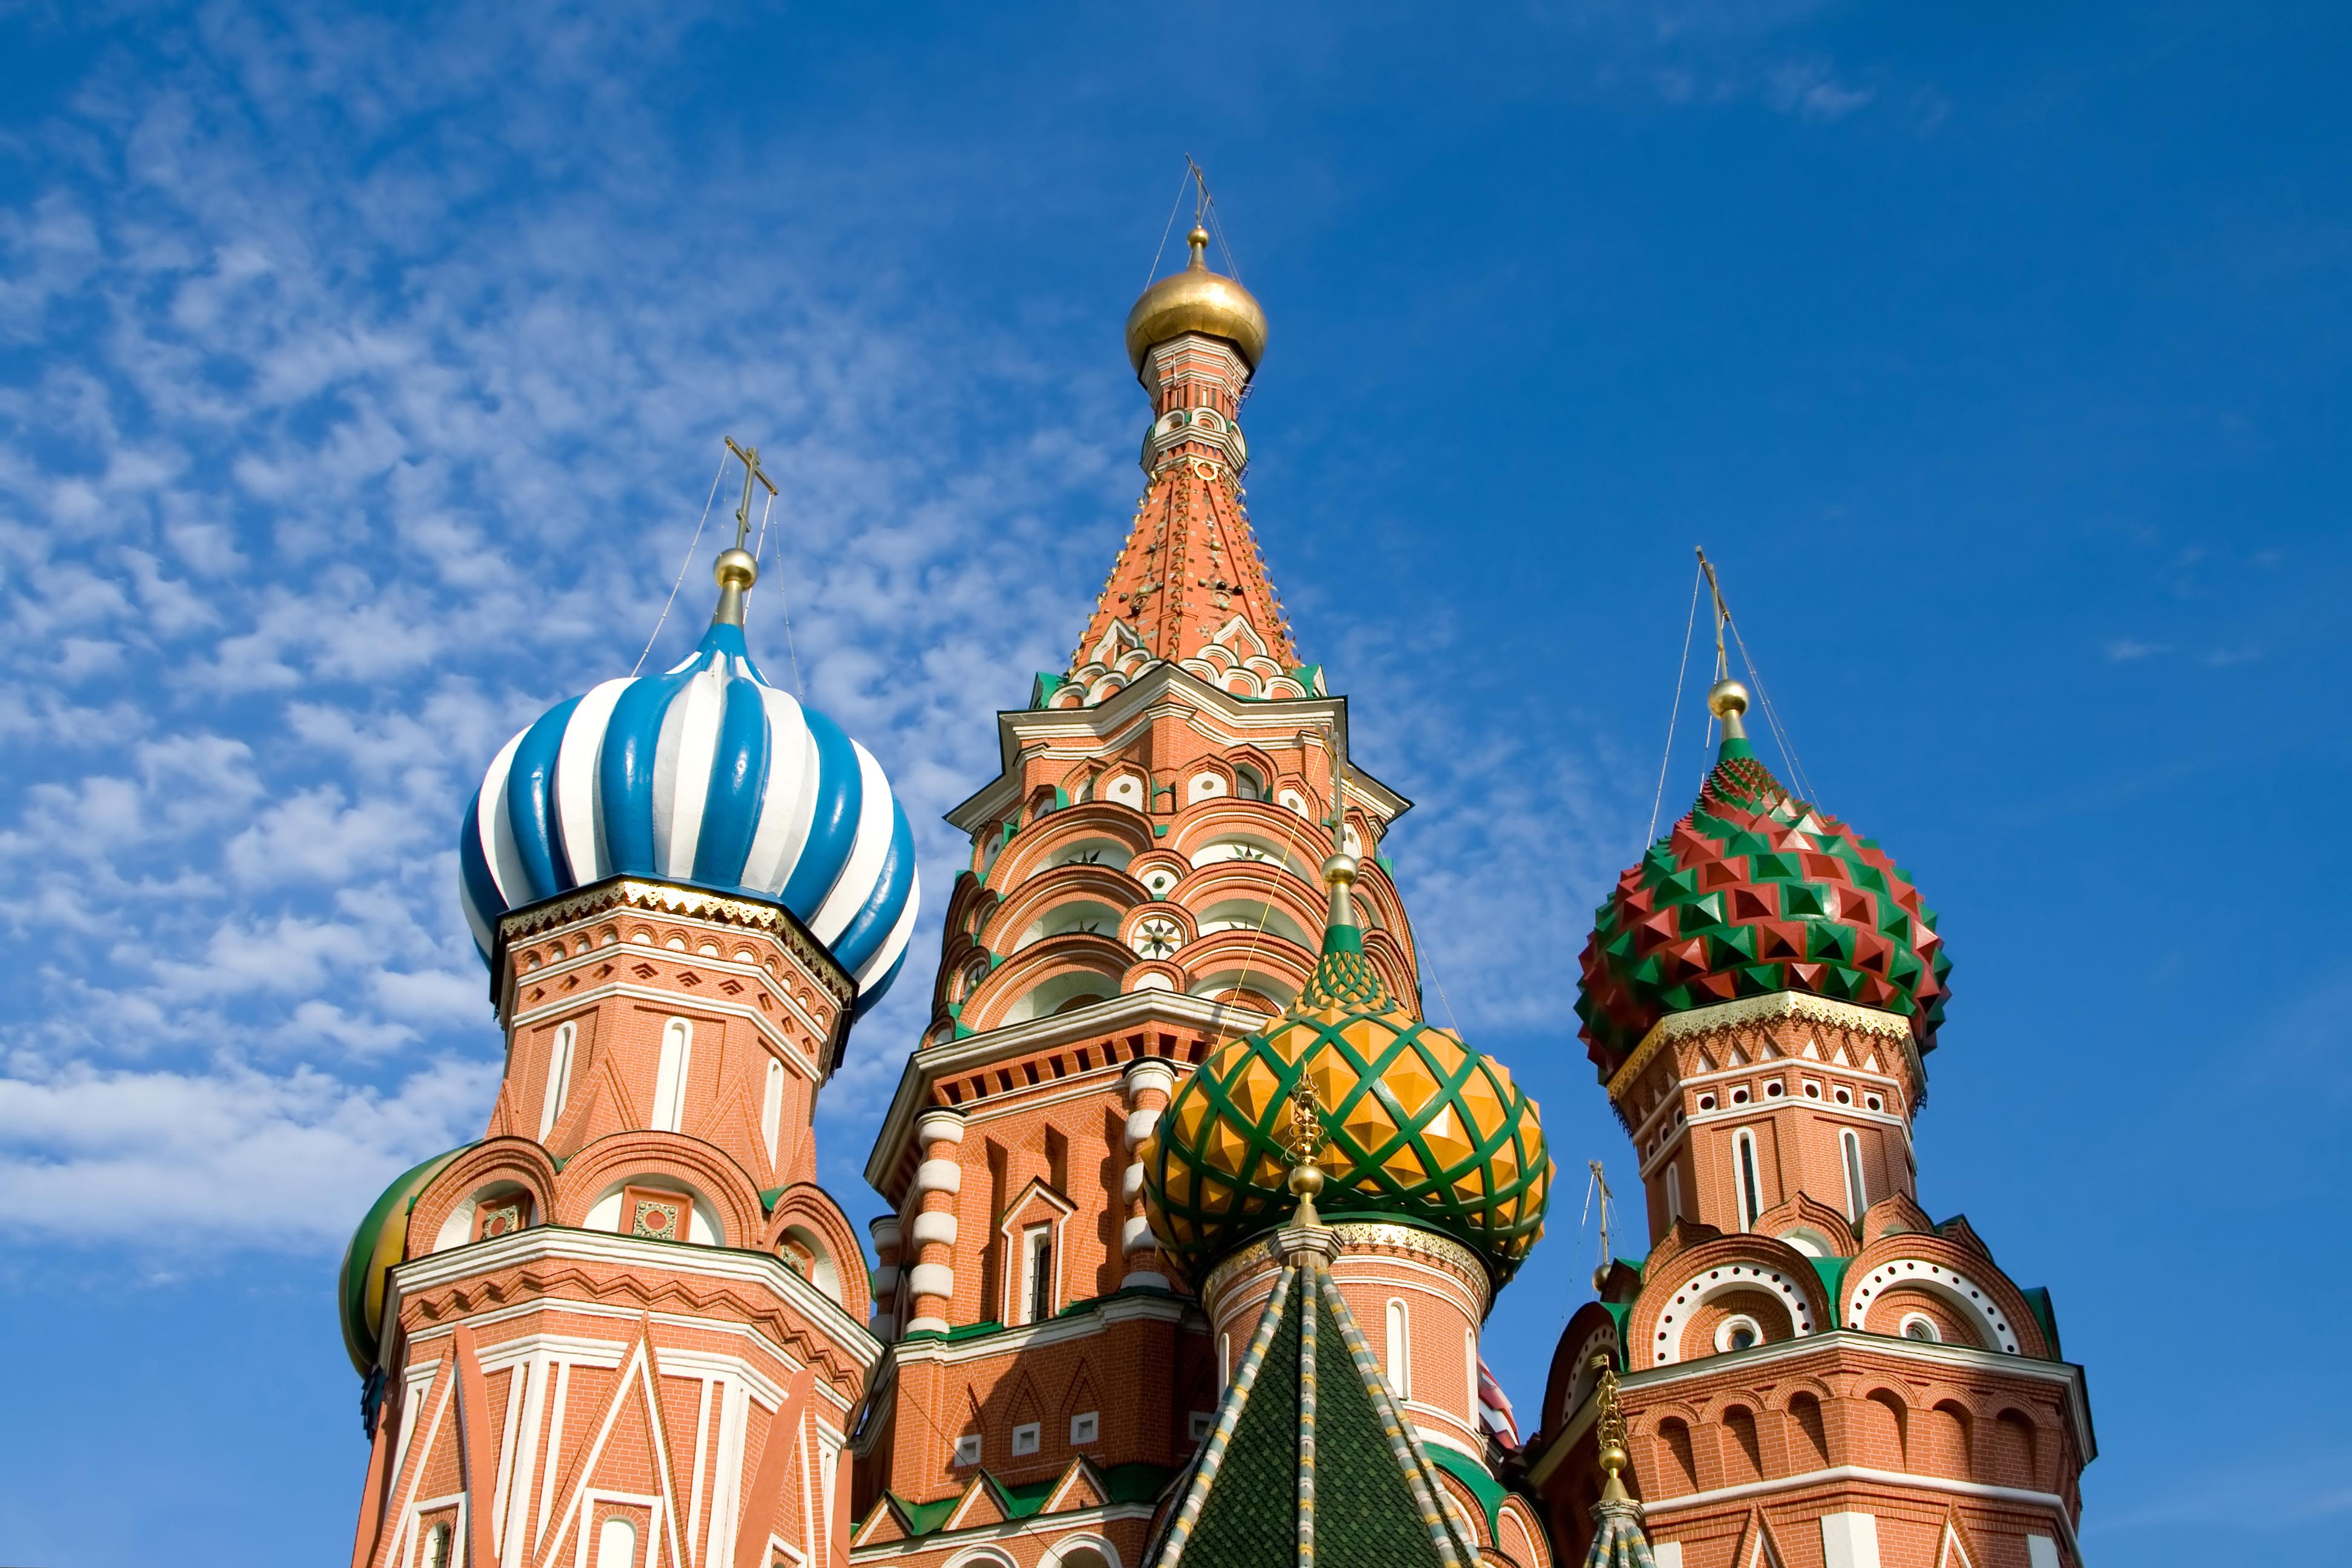 st basil cathedral moscow russia PFWZSKQ #новости акция, Беларусь, москва